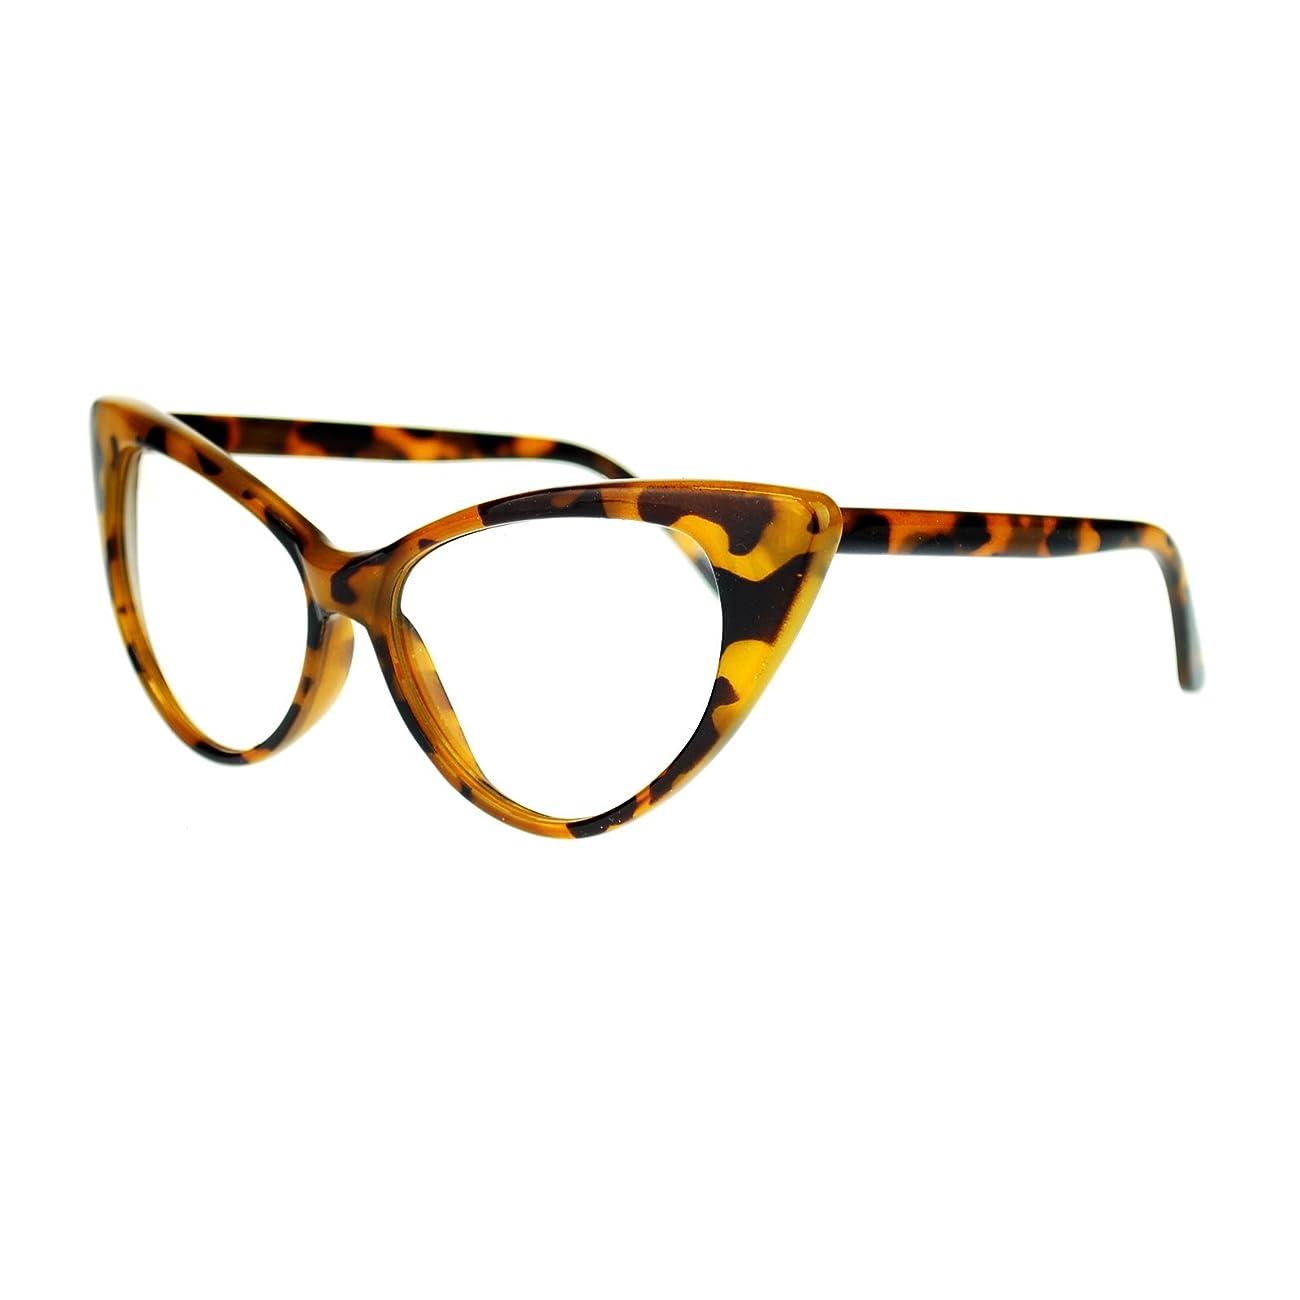 Womens Goth Mod Chic Classic Retro Cat Eye Optical Glasses 2